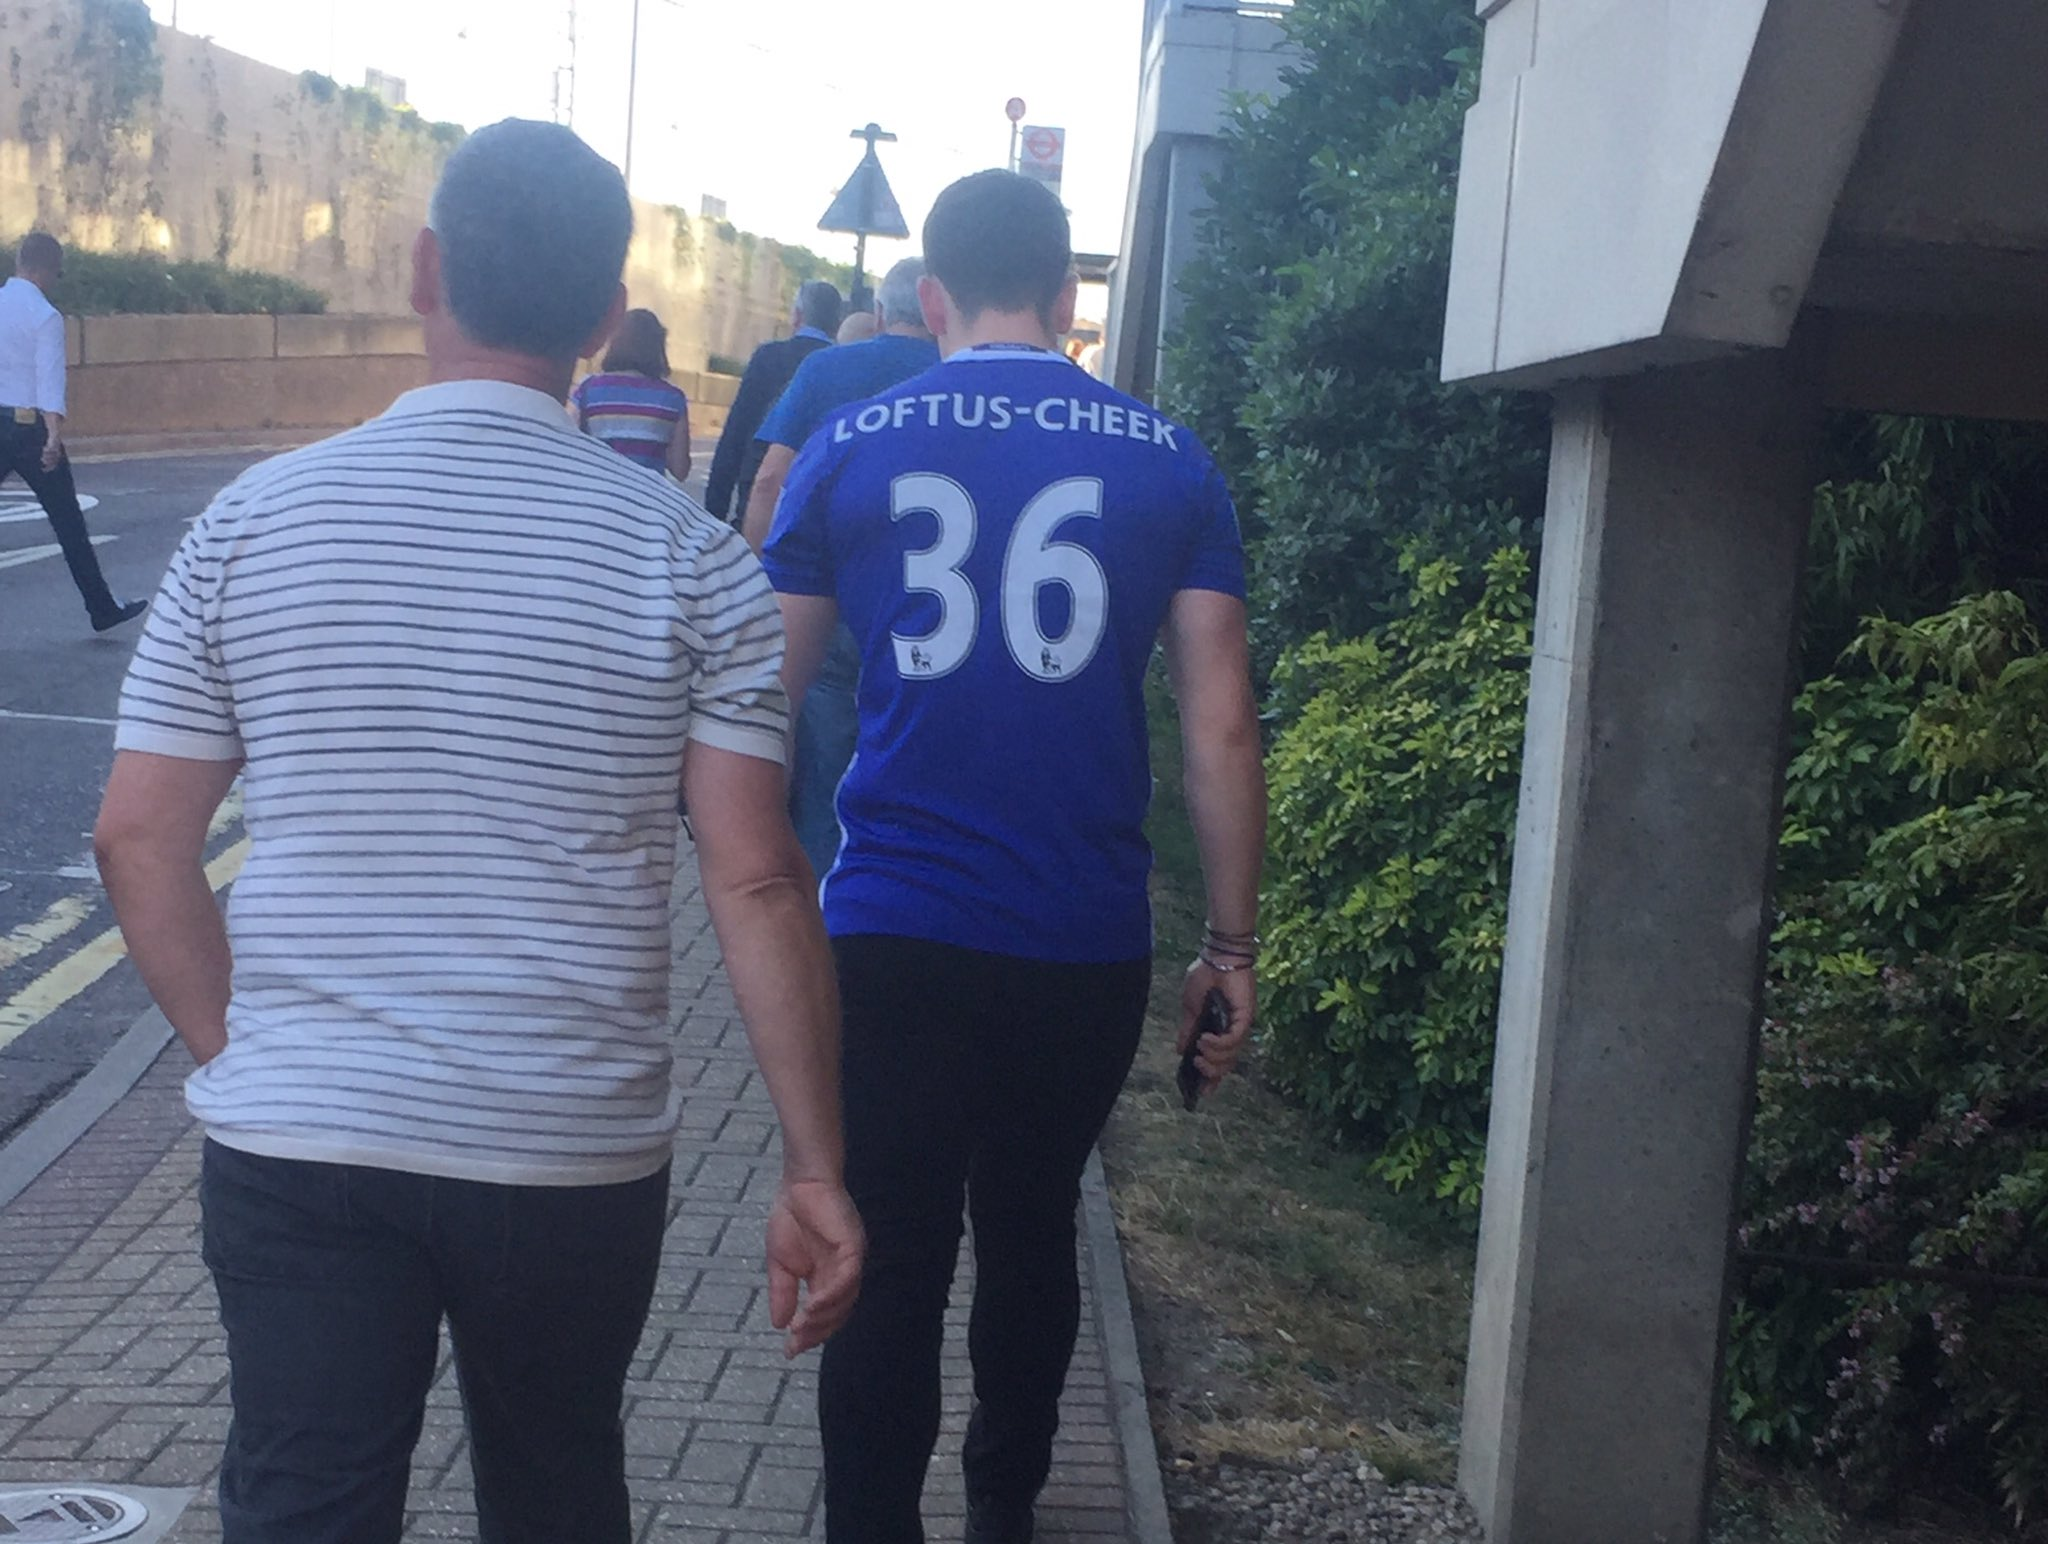 On the way to Stamford Bridge. New season optimism, eh? https://t.co/mZMCytVwmR